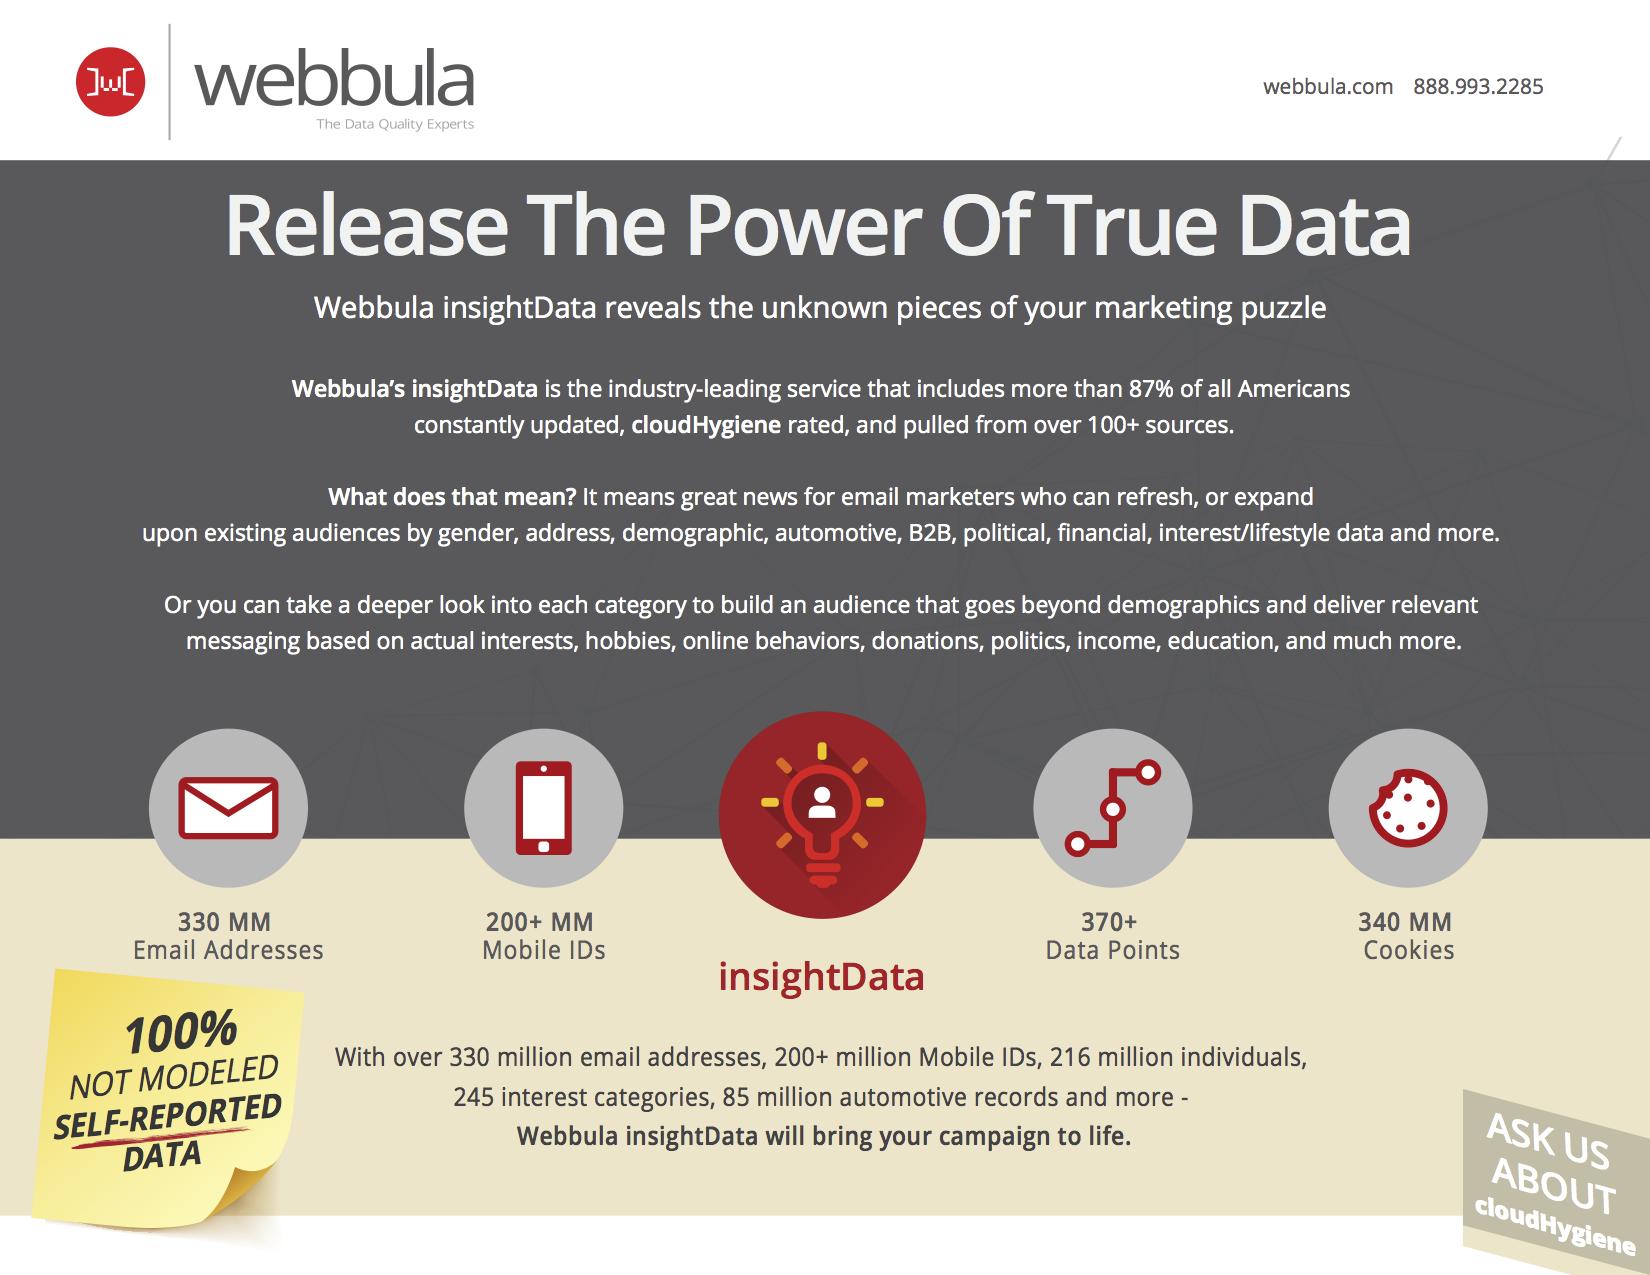 Webbula insightData release the power of true data